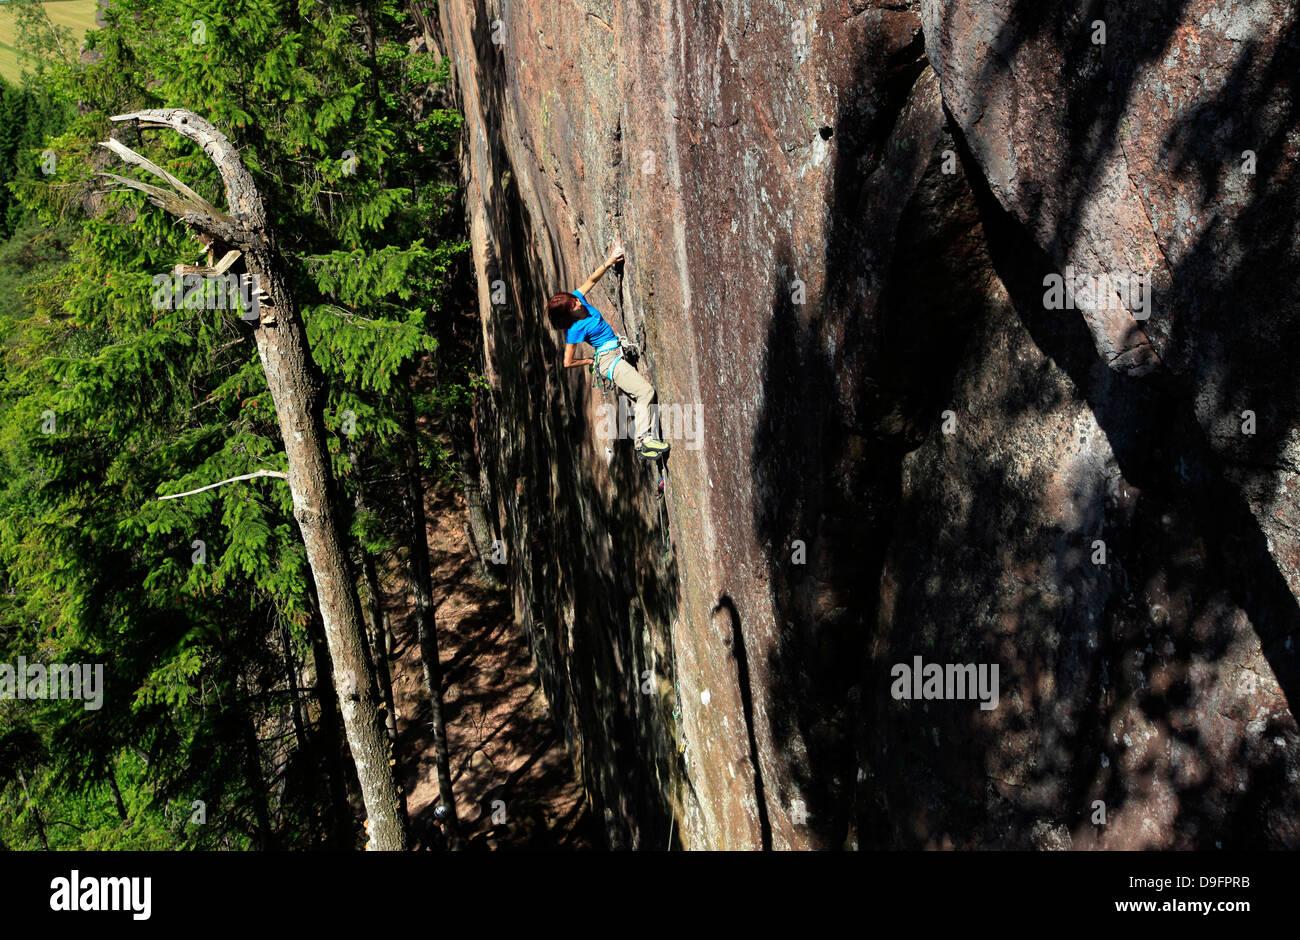 A climber scales cliffs at Bohuslan, Sweden, Scandinavia - Stock Image